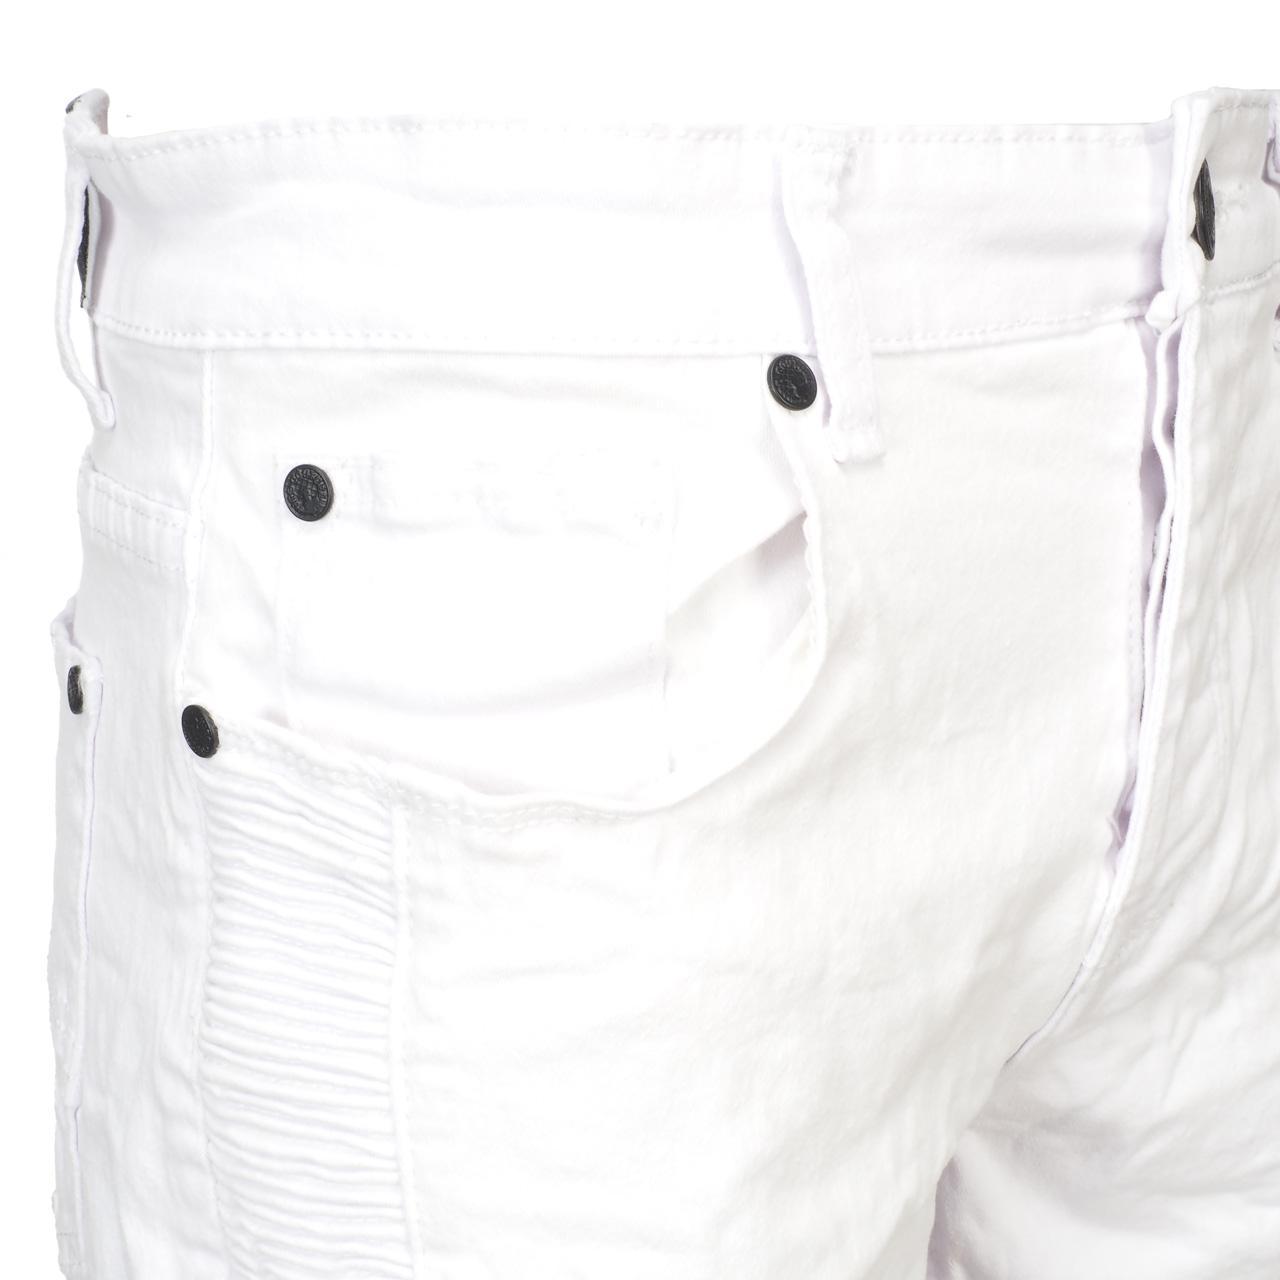 Bermuda-Shorts-Hite-Couture-Vibrate-White-Bermuda-White-11650-New thumbnail 4